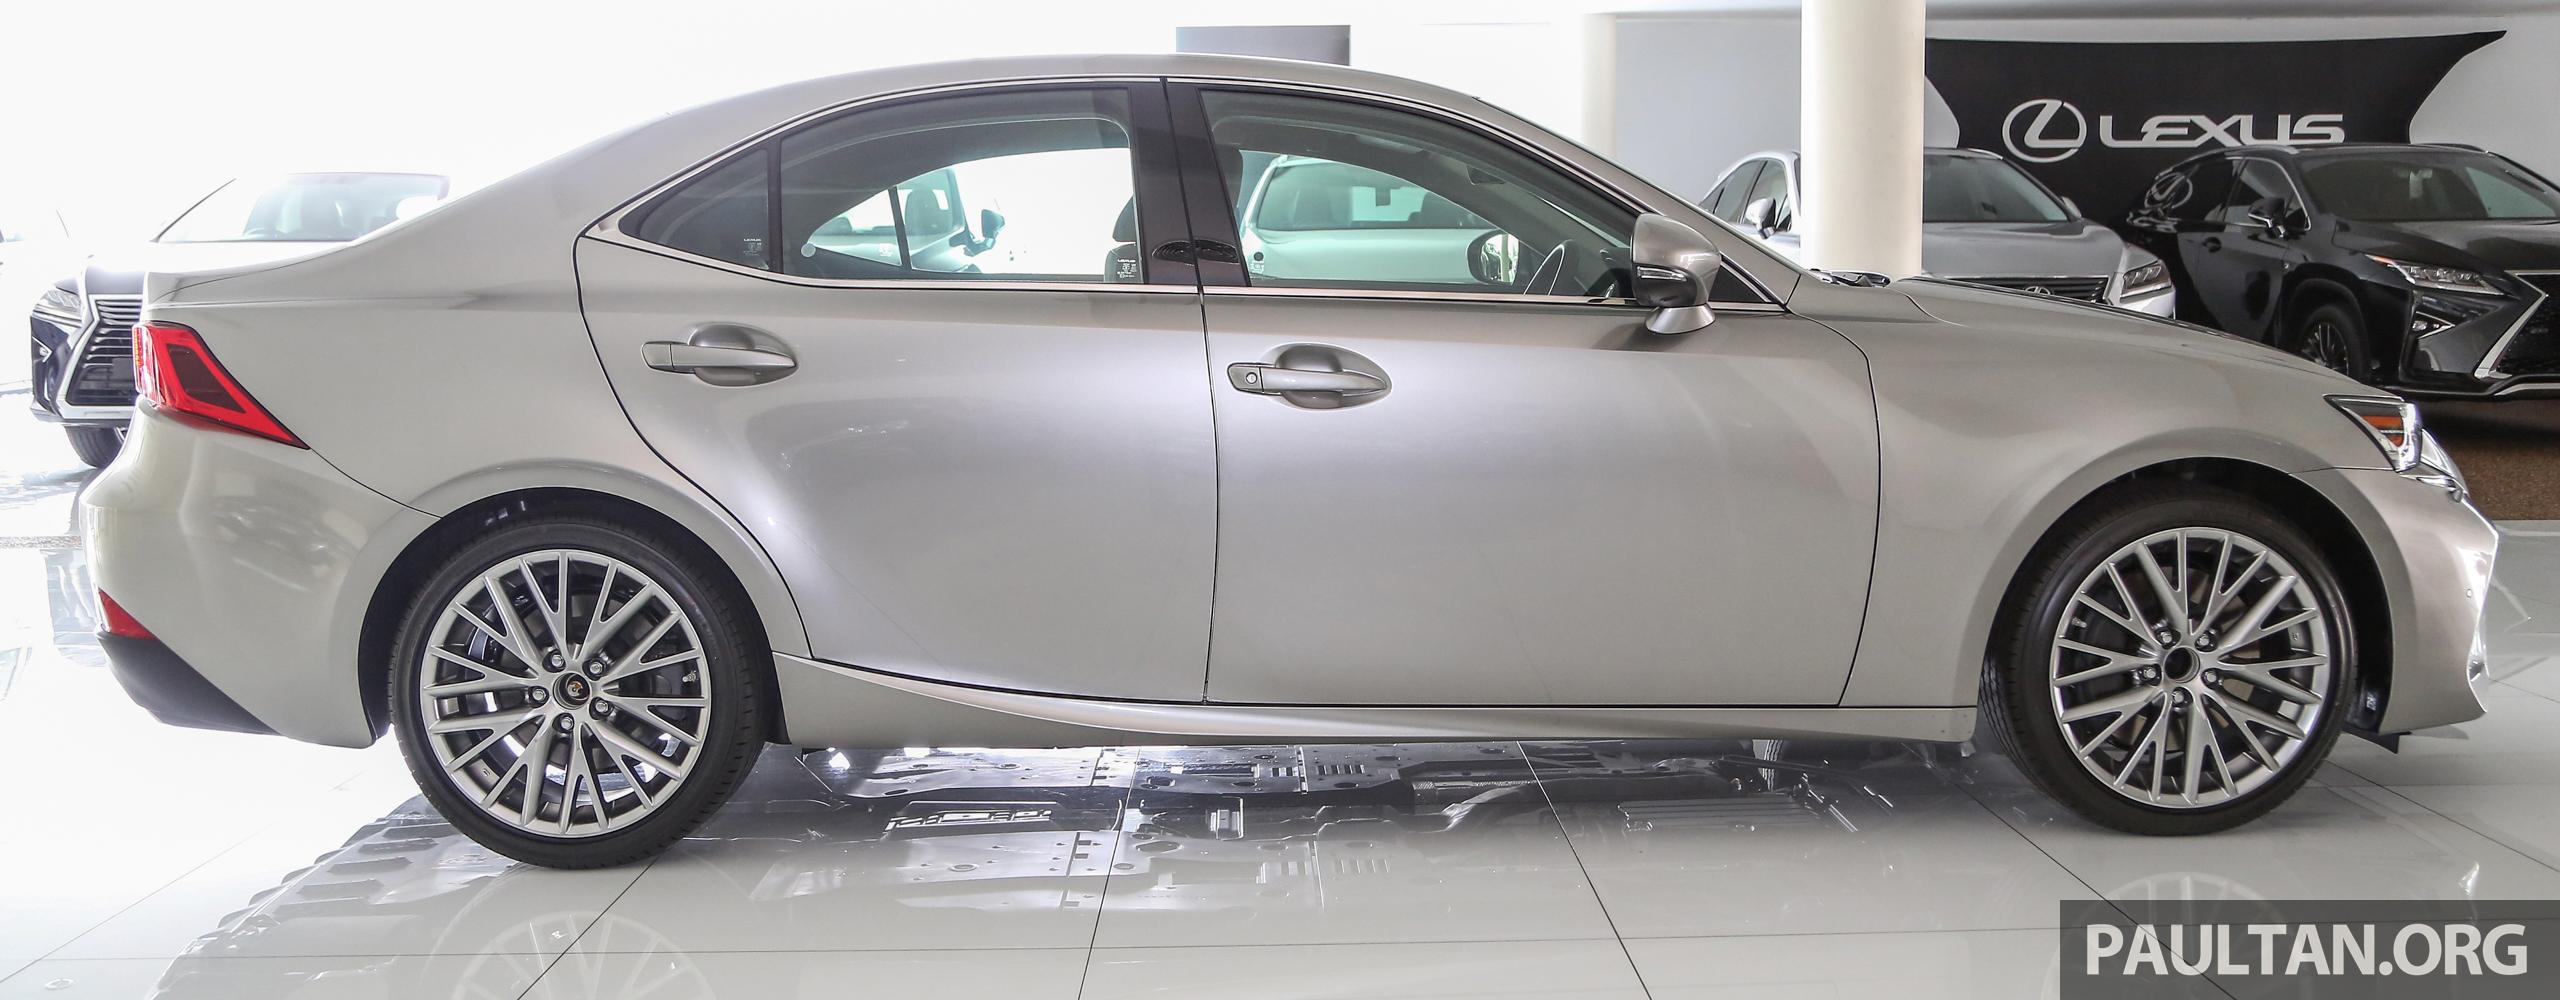 Lexus Is Facelift Kini Di M Sia 4 Varian Dari Rm298k